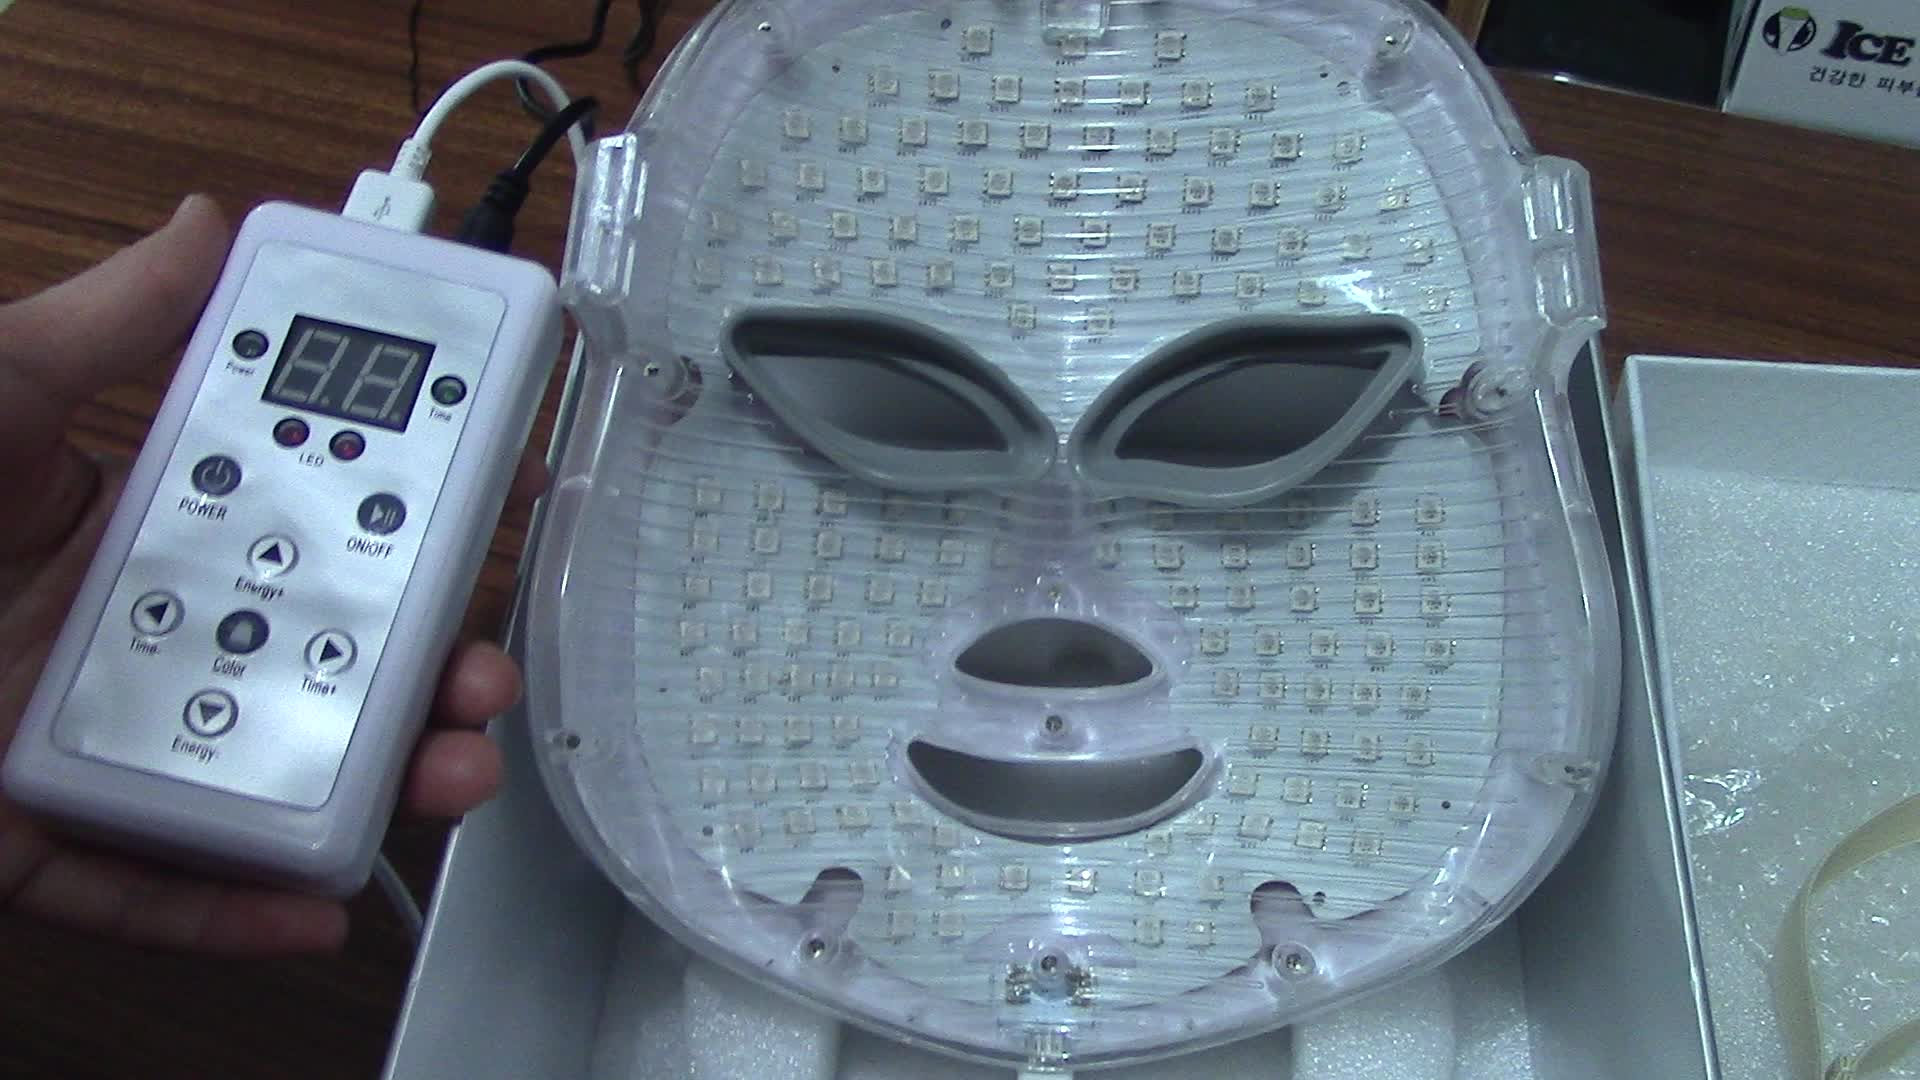 Anti-invecchiamento Rimuovere Rughe Ringiovanimento Macchina PDT Led Photon Terapia Viso Lifting Maschera LED